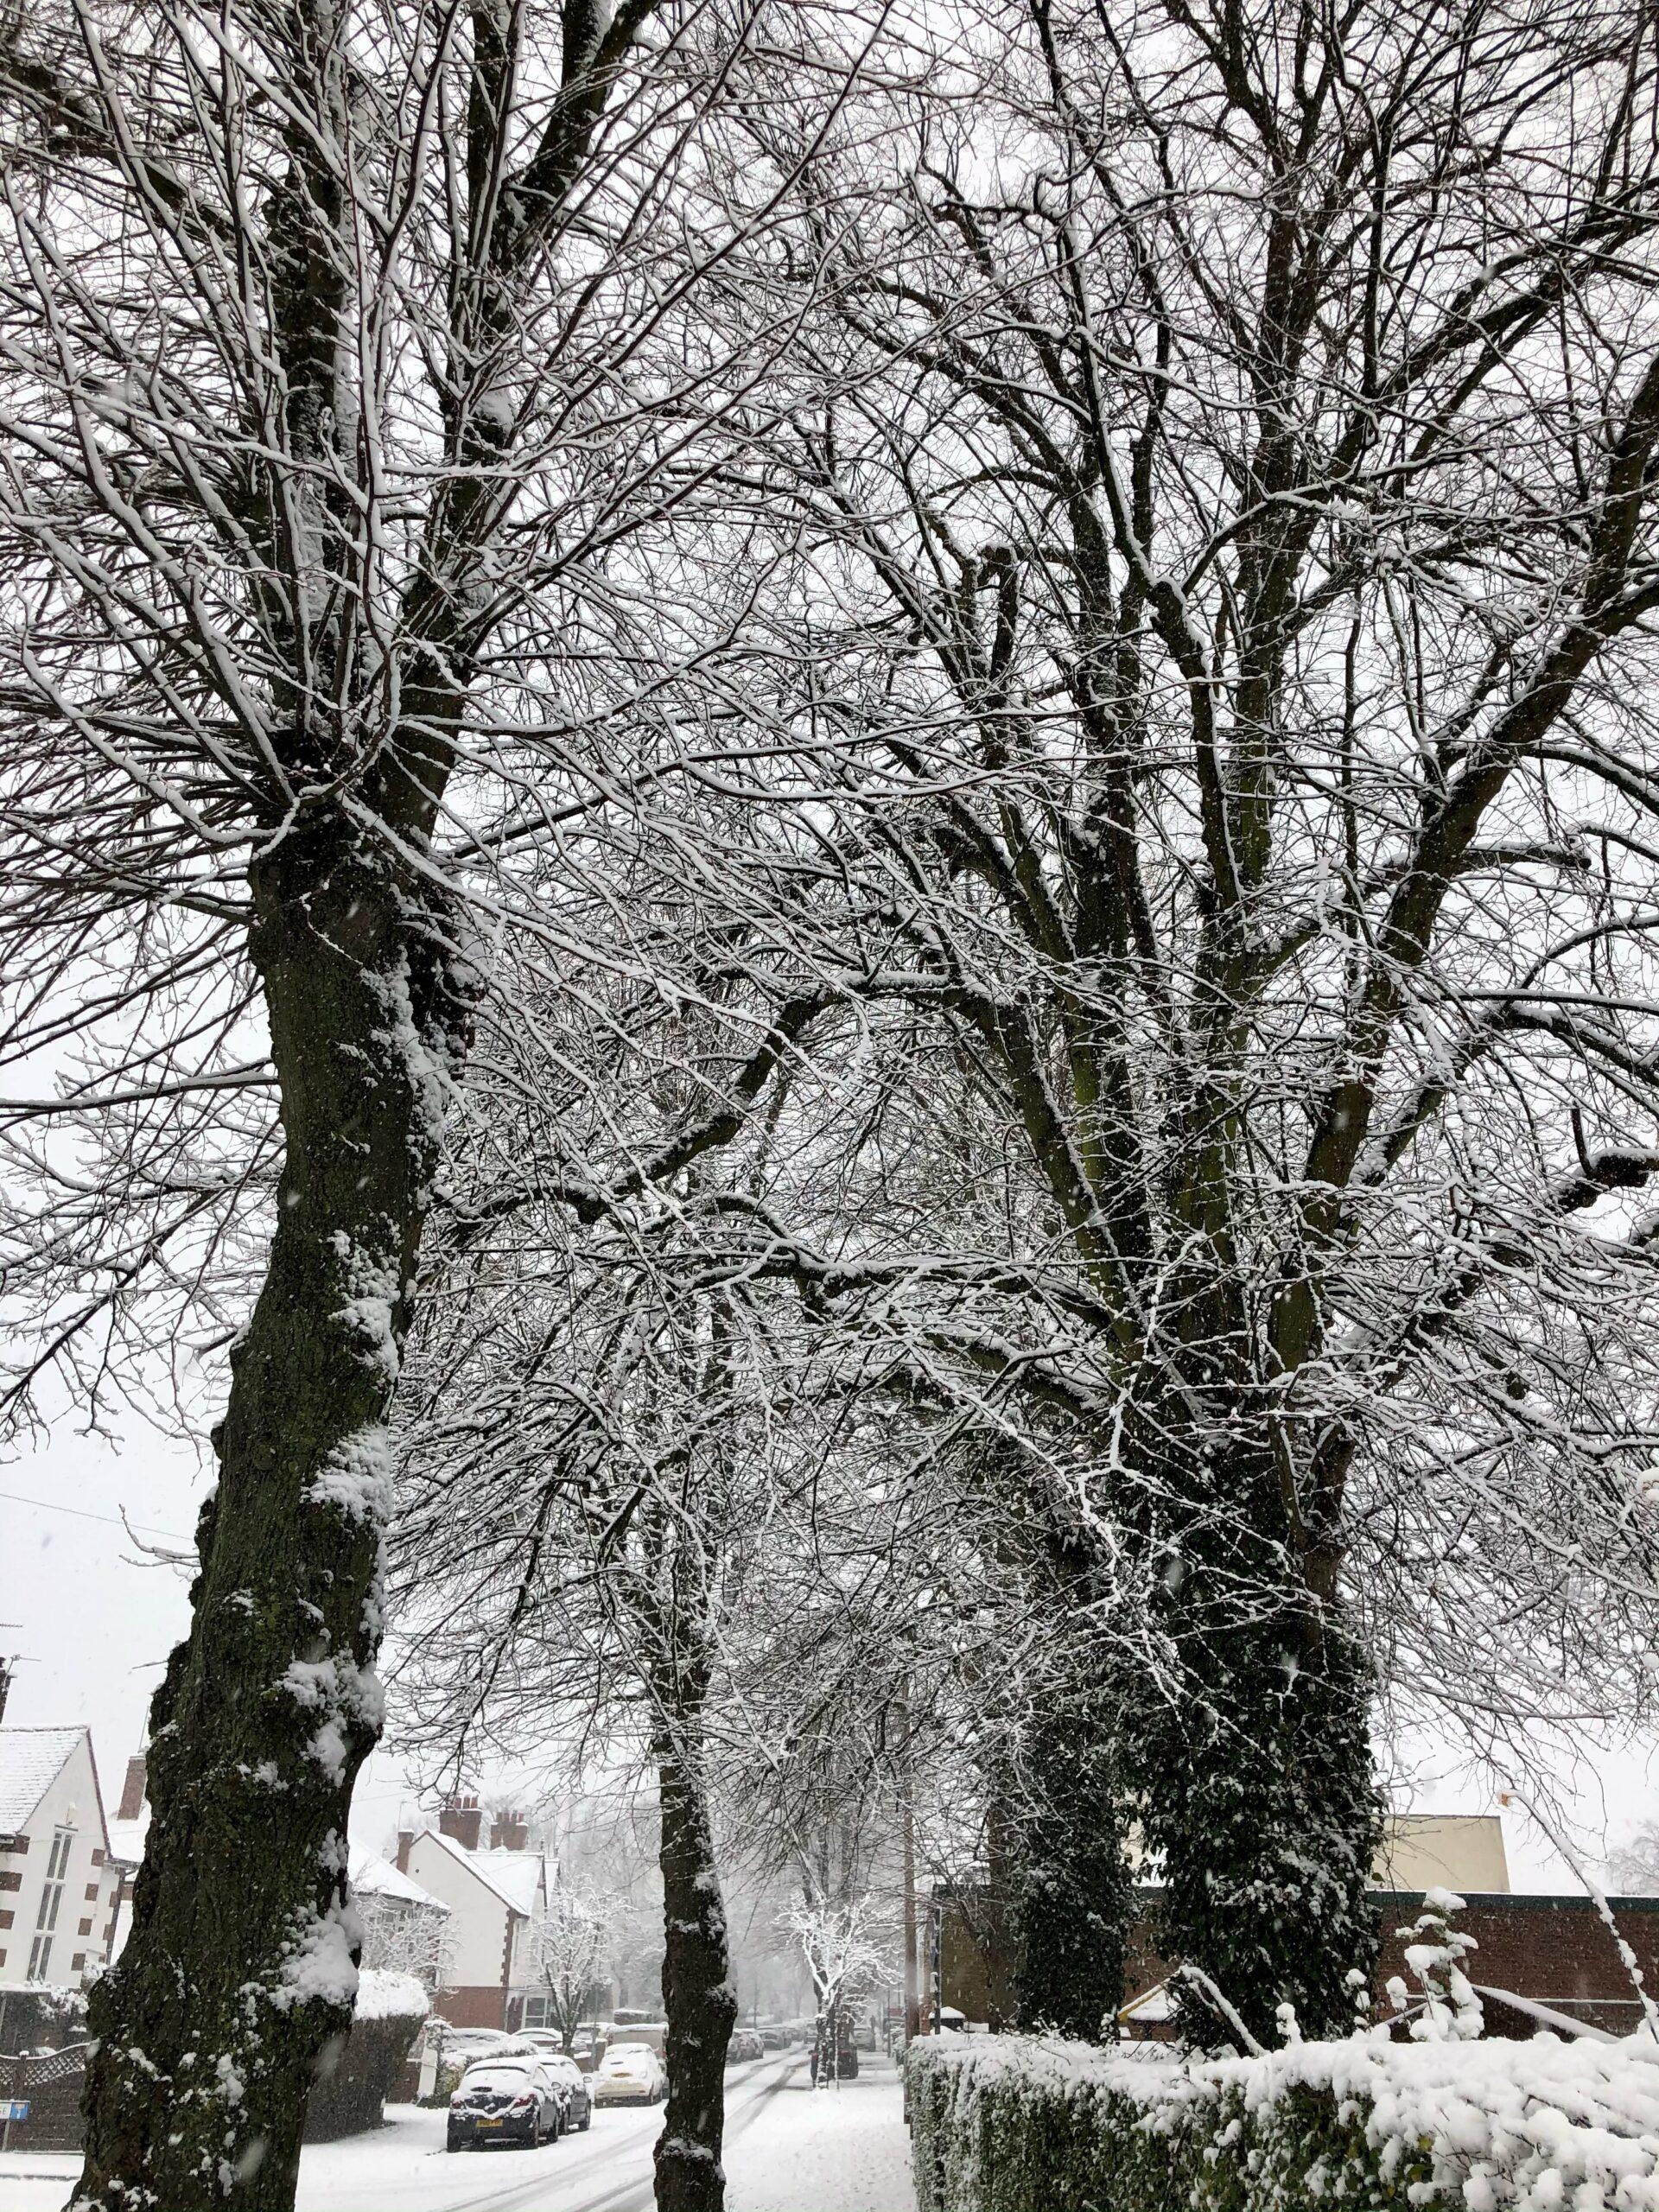 Nicola-Dawson-Snow-in-Syston-1-broad-St-scaled